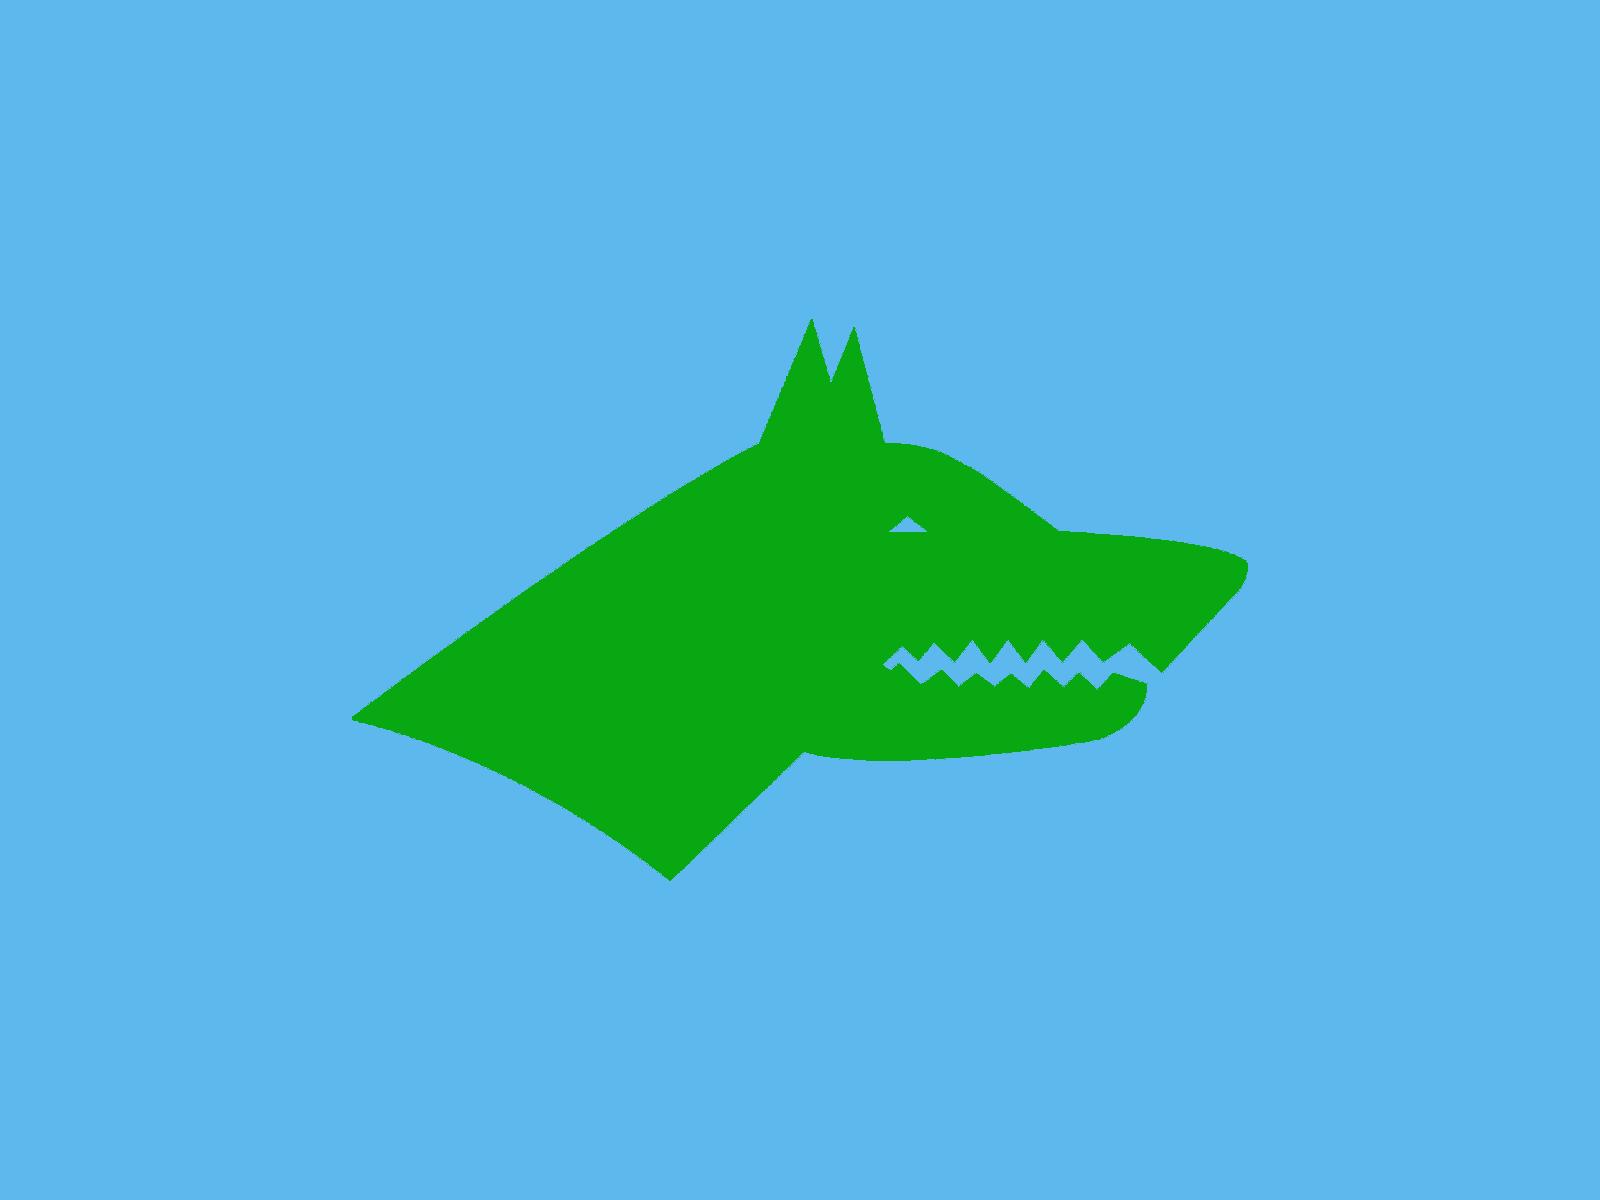 Orjinal Göktürk bayrağı